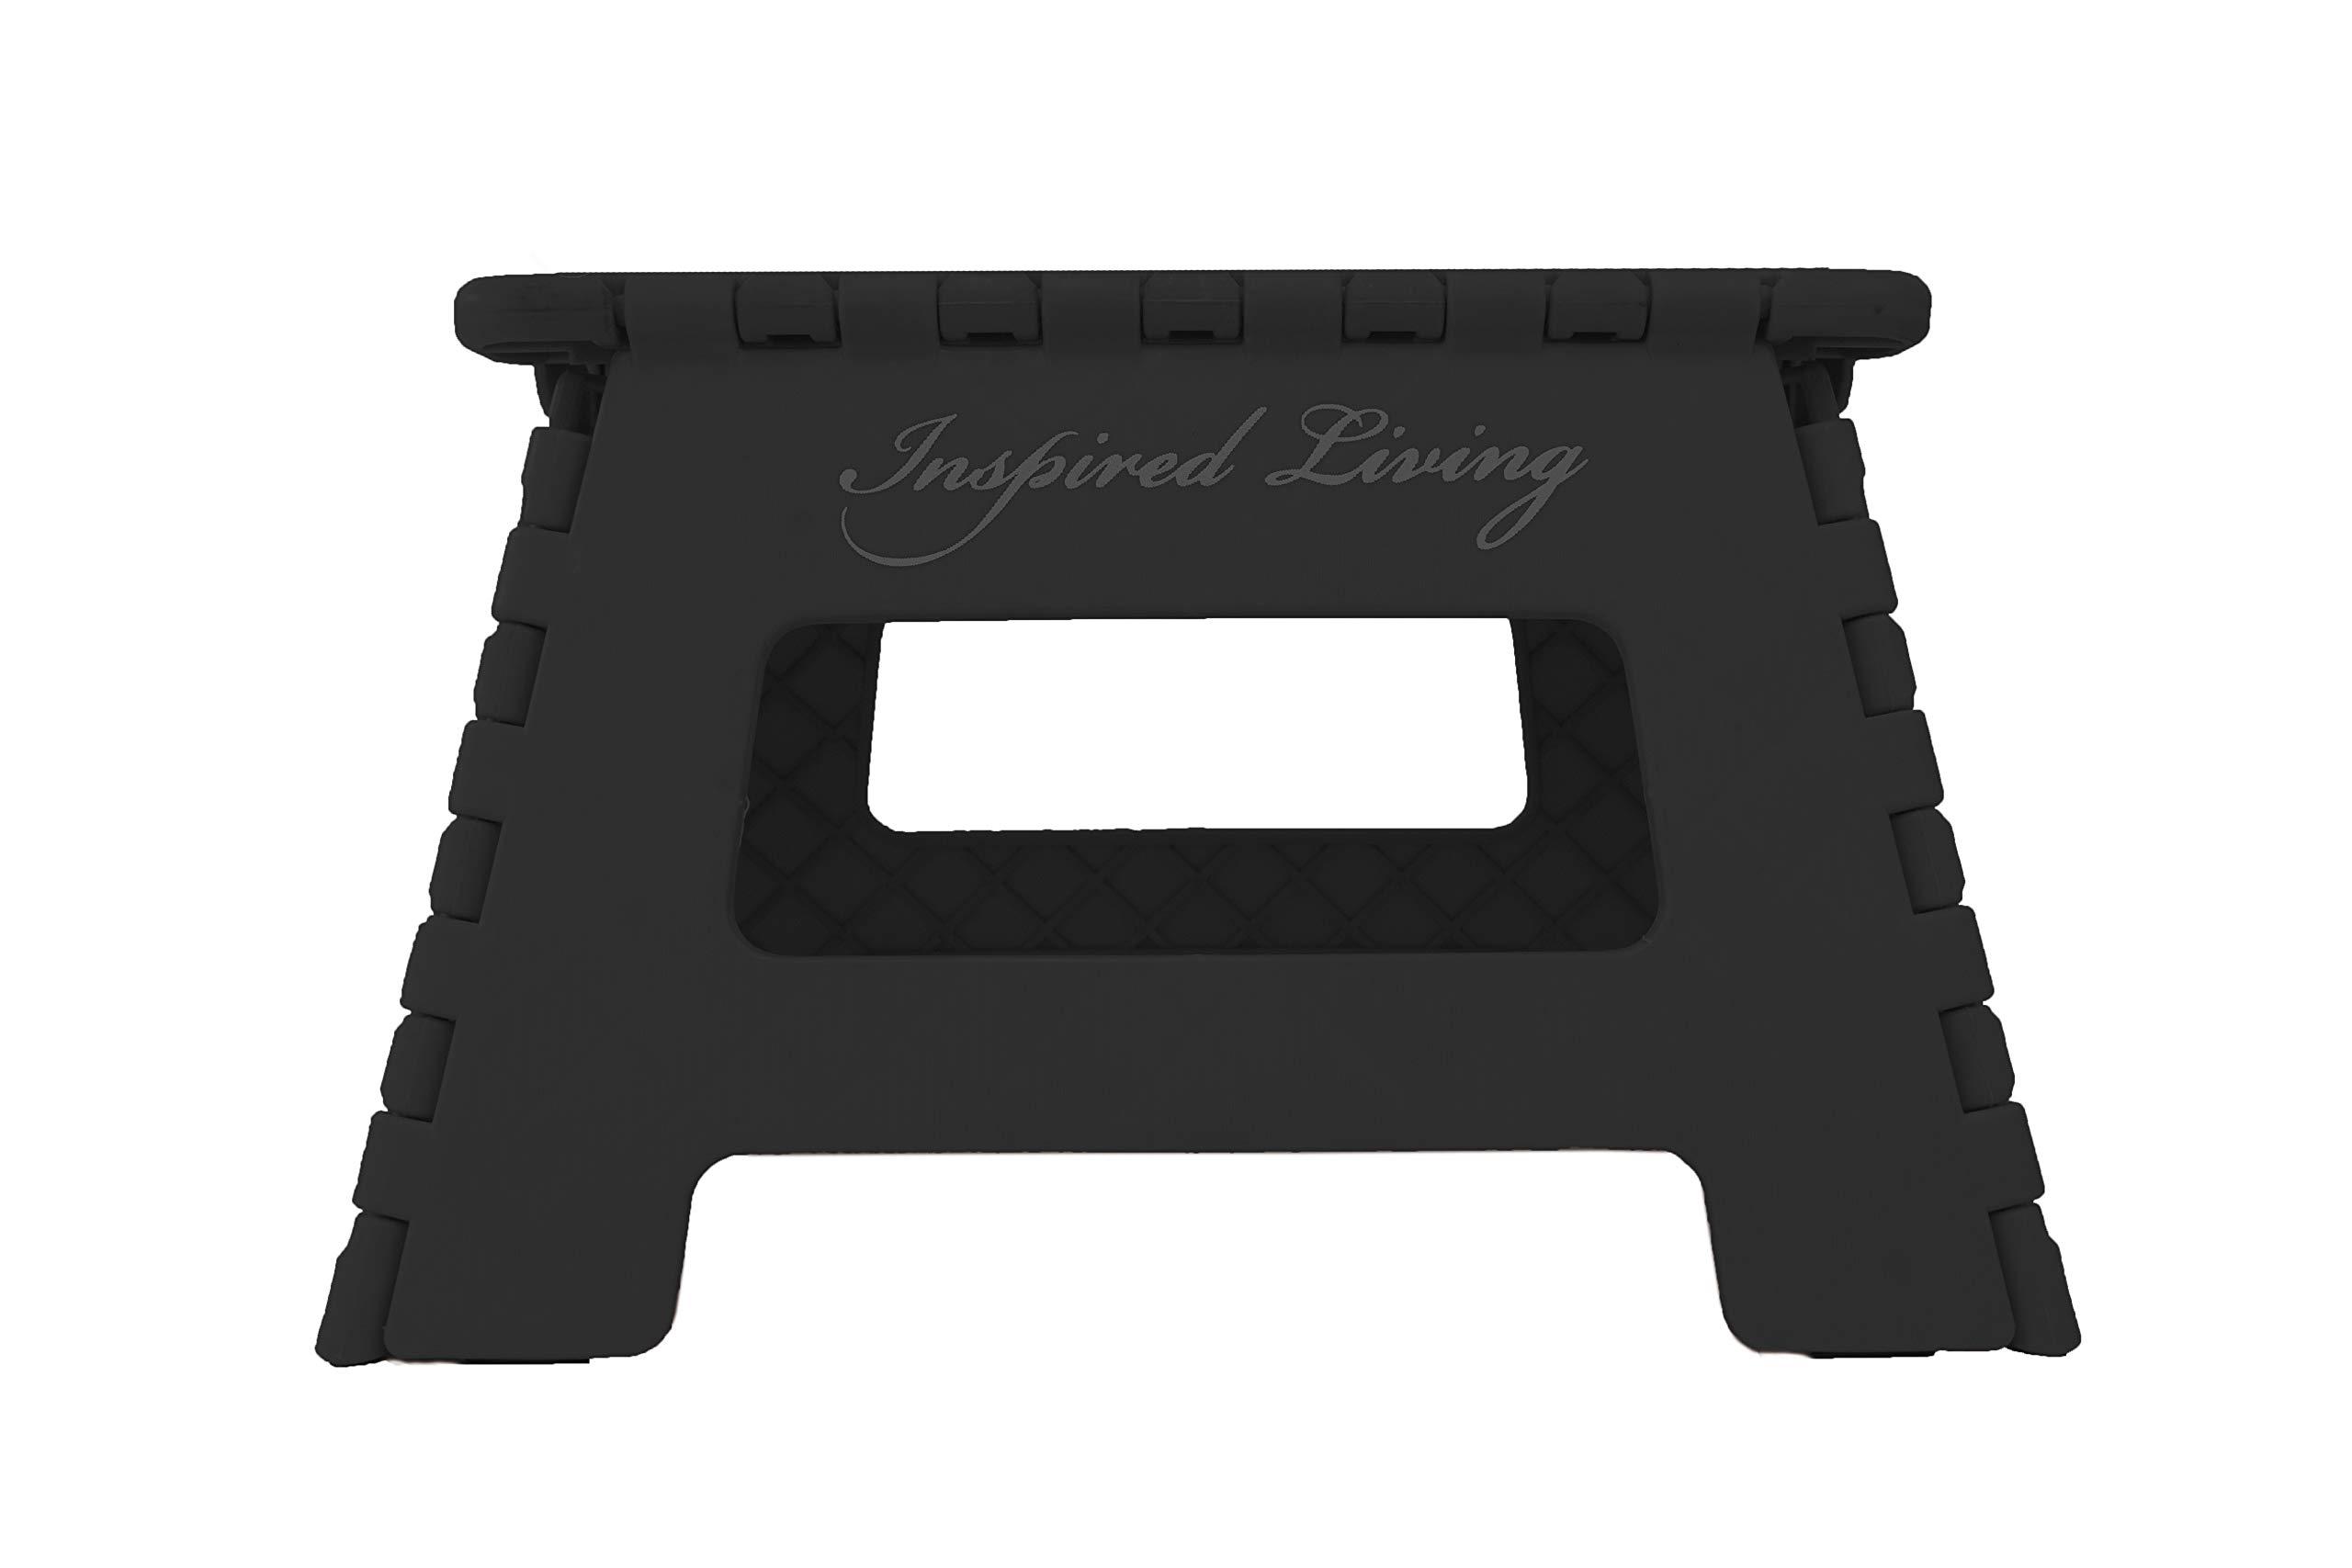 Inspired Living Folding Heavy Duty Step Stool in Black - (9'' High)